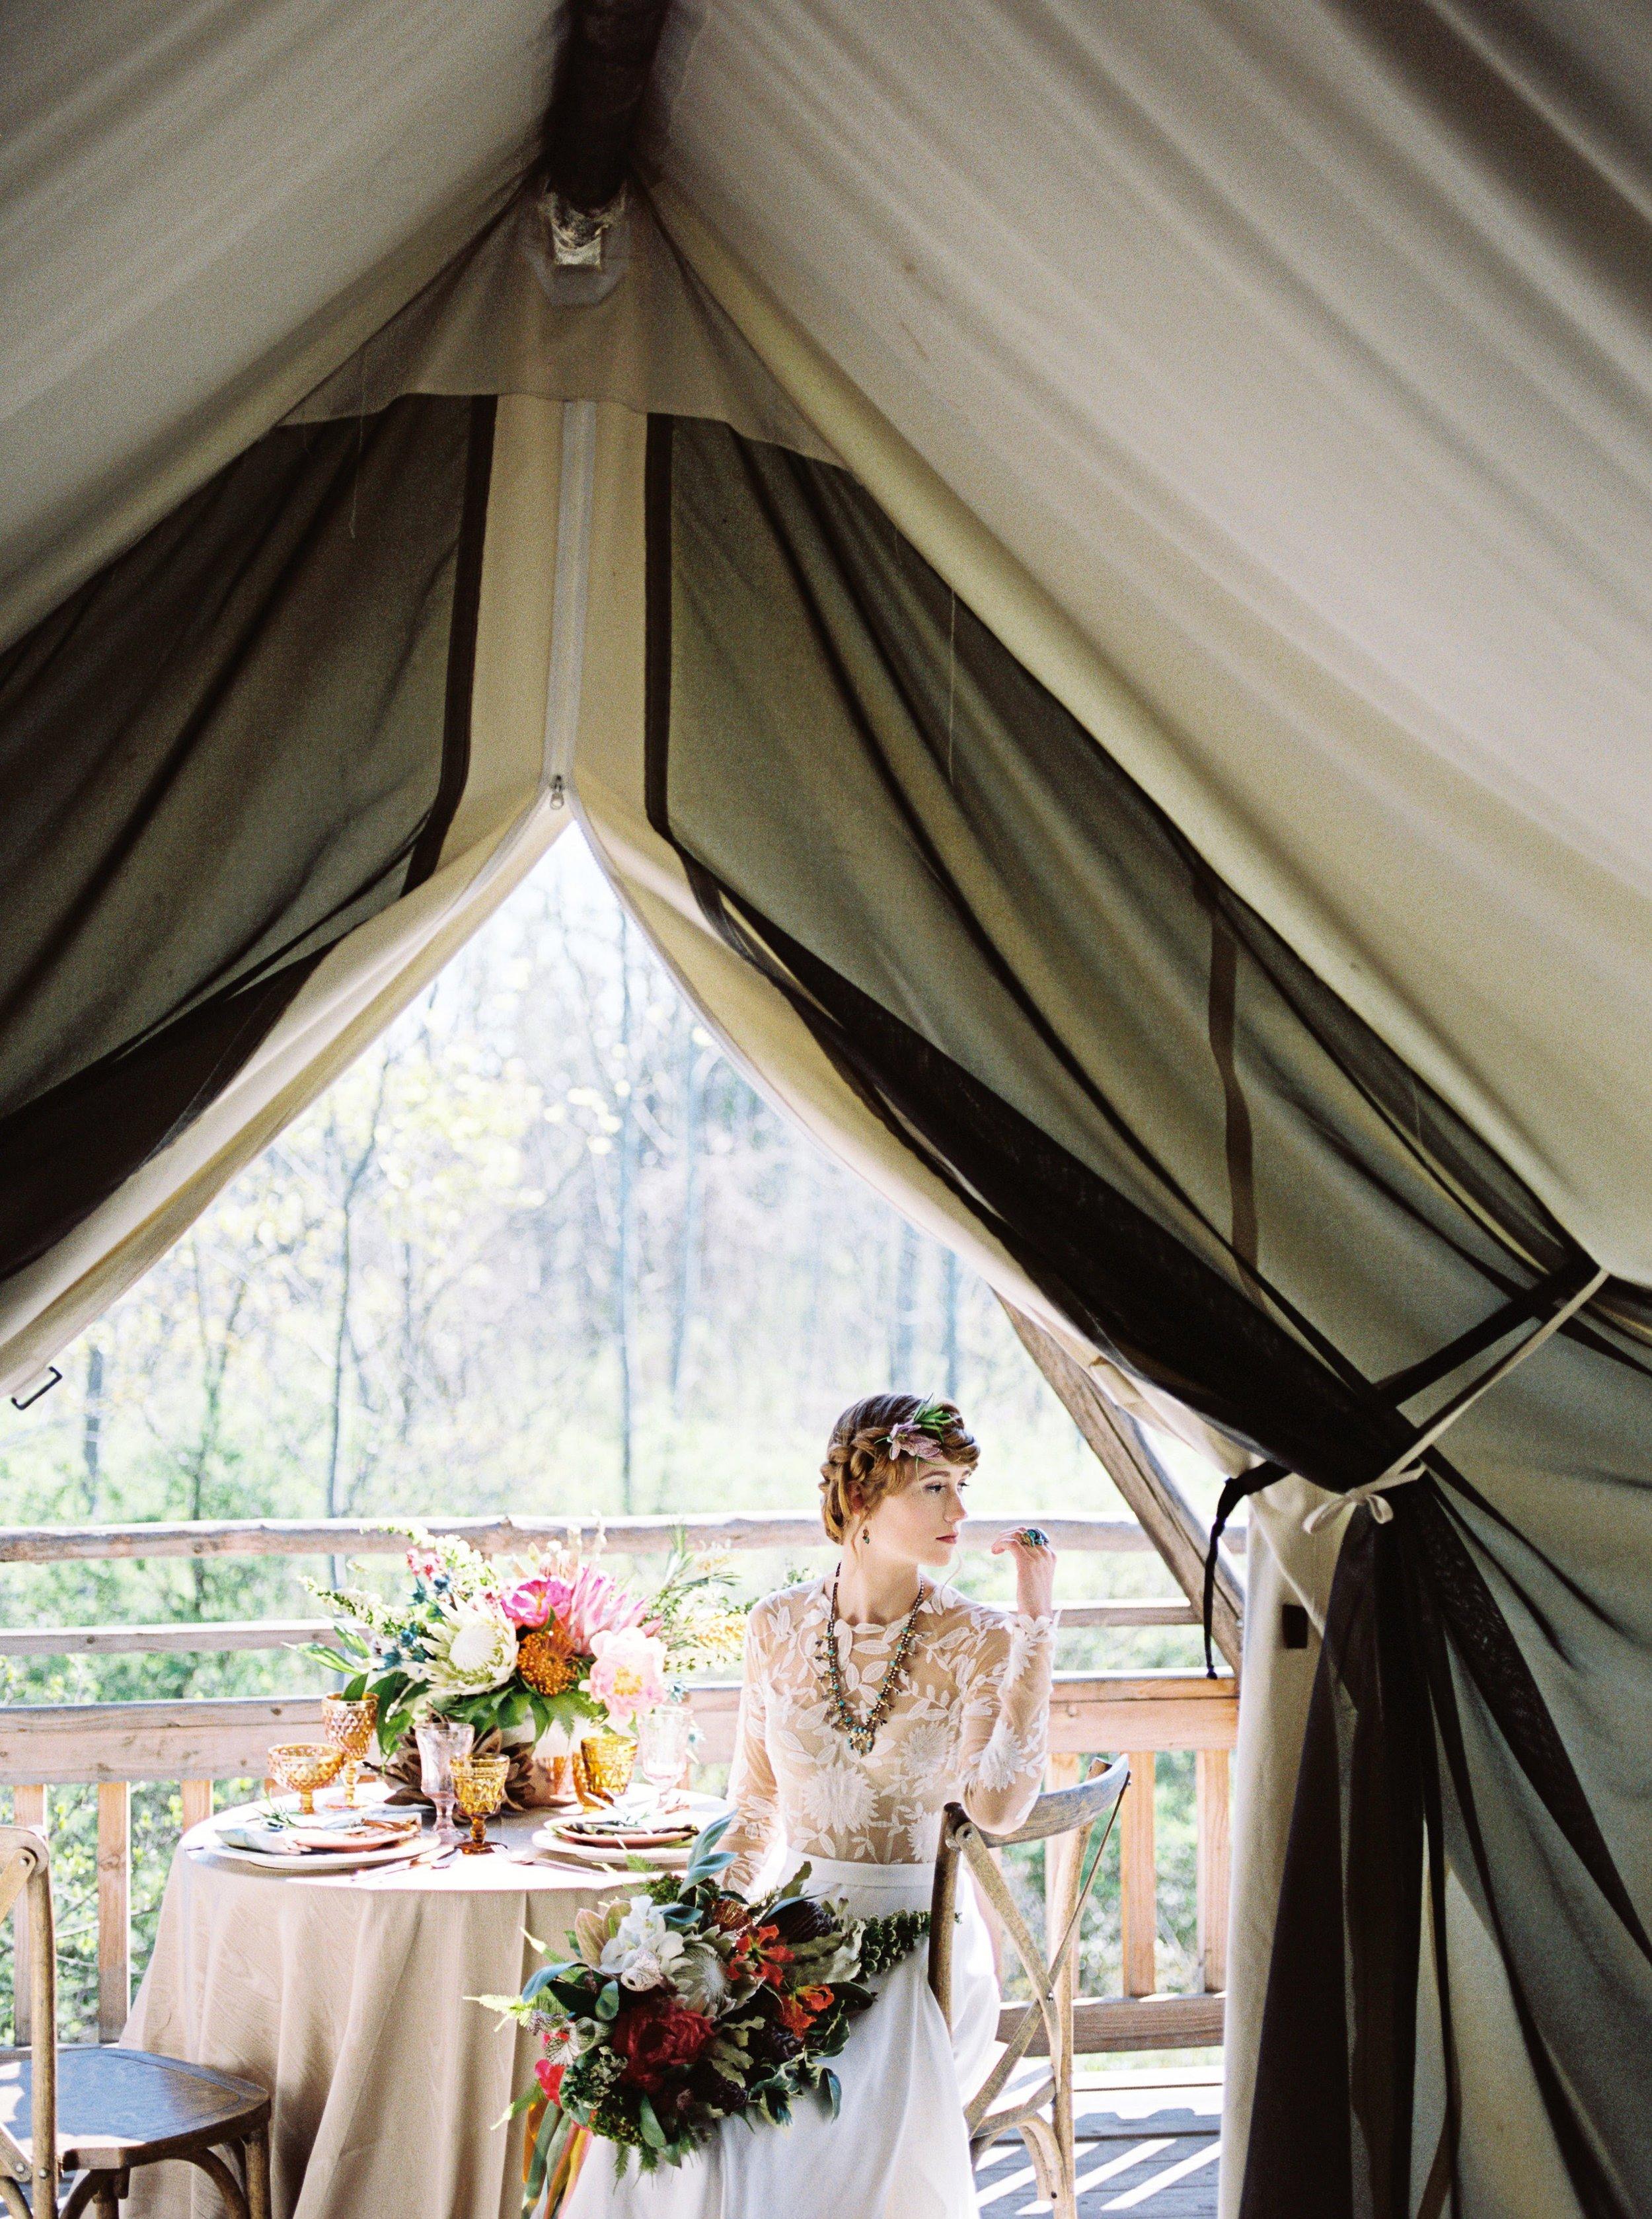 Alexandra-Elise-Photography-Ali-Reed-Film-Wedding-Photographer-Ithaca-New-York-Firelight-Camps-054.jpg